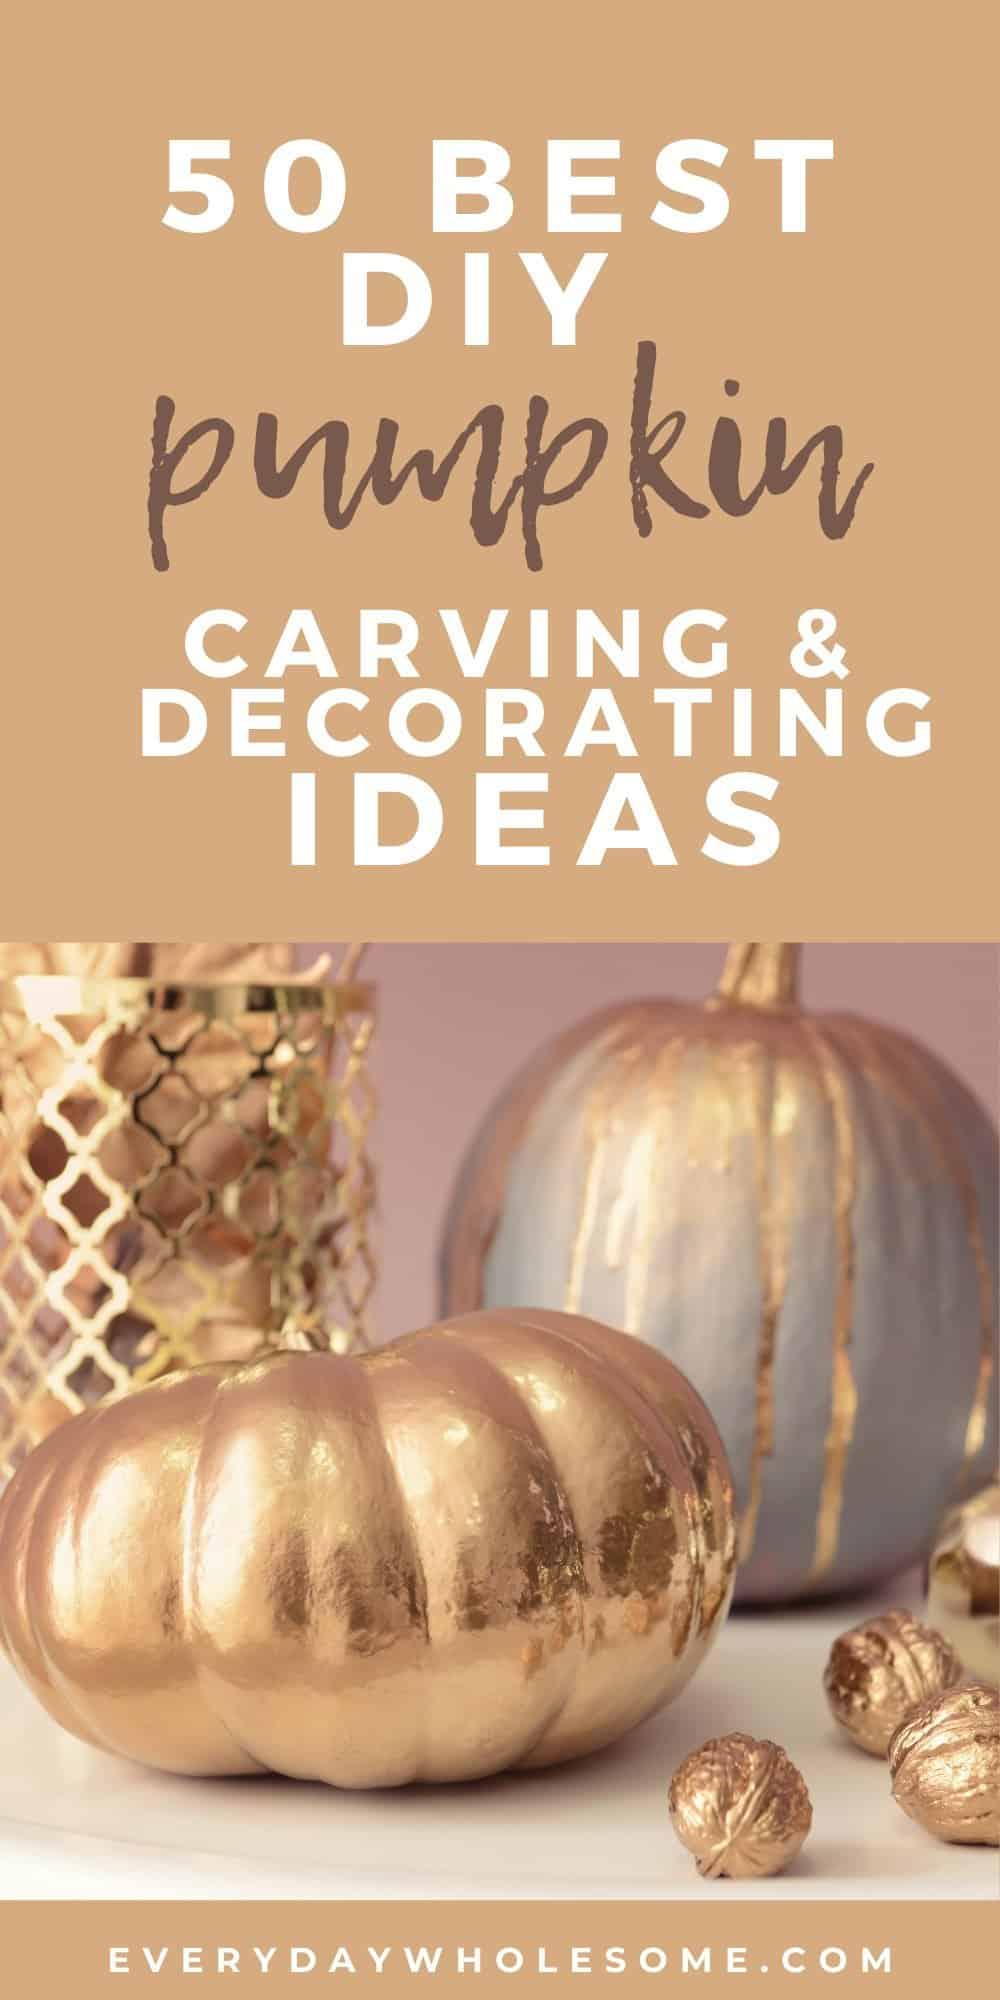 50 best diy pumpkin projects crafts